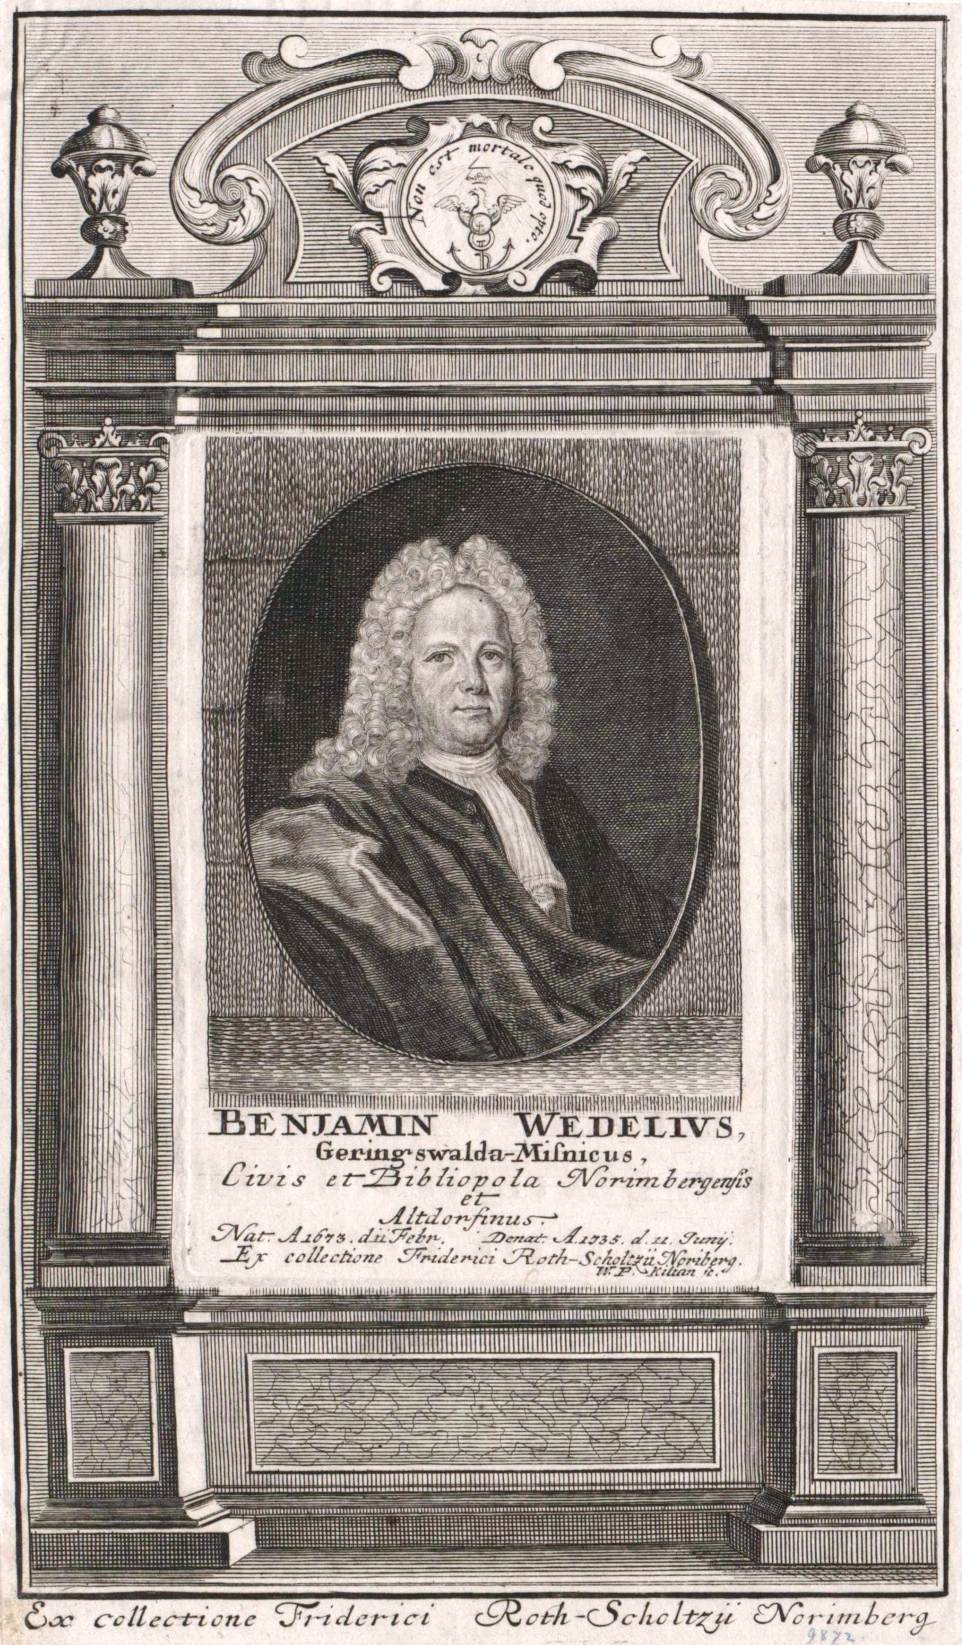 Benjamin Wedel